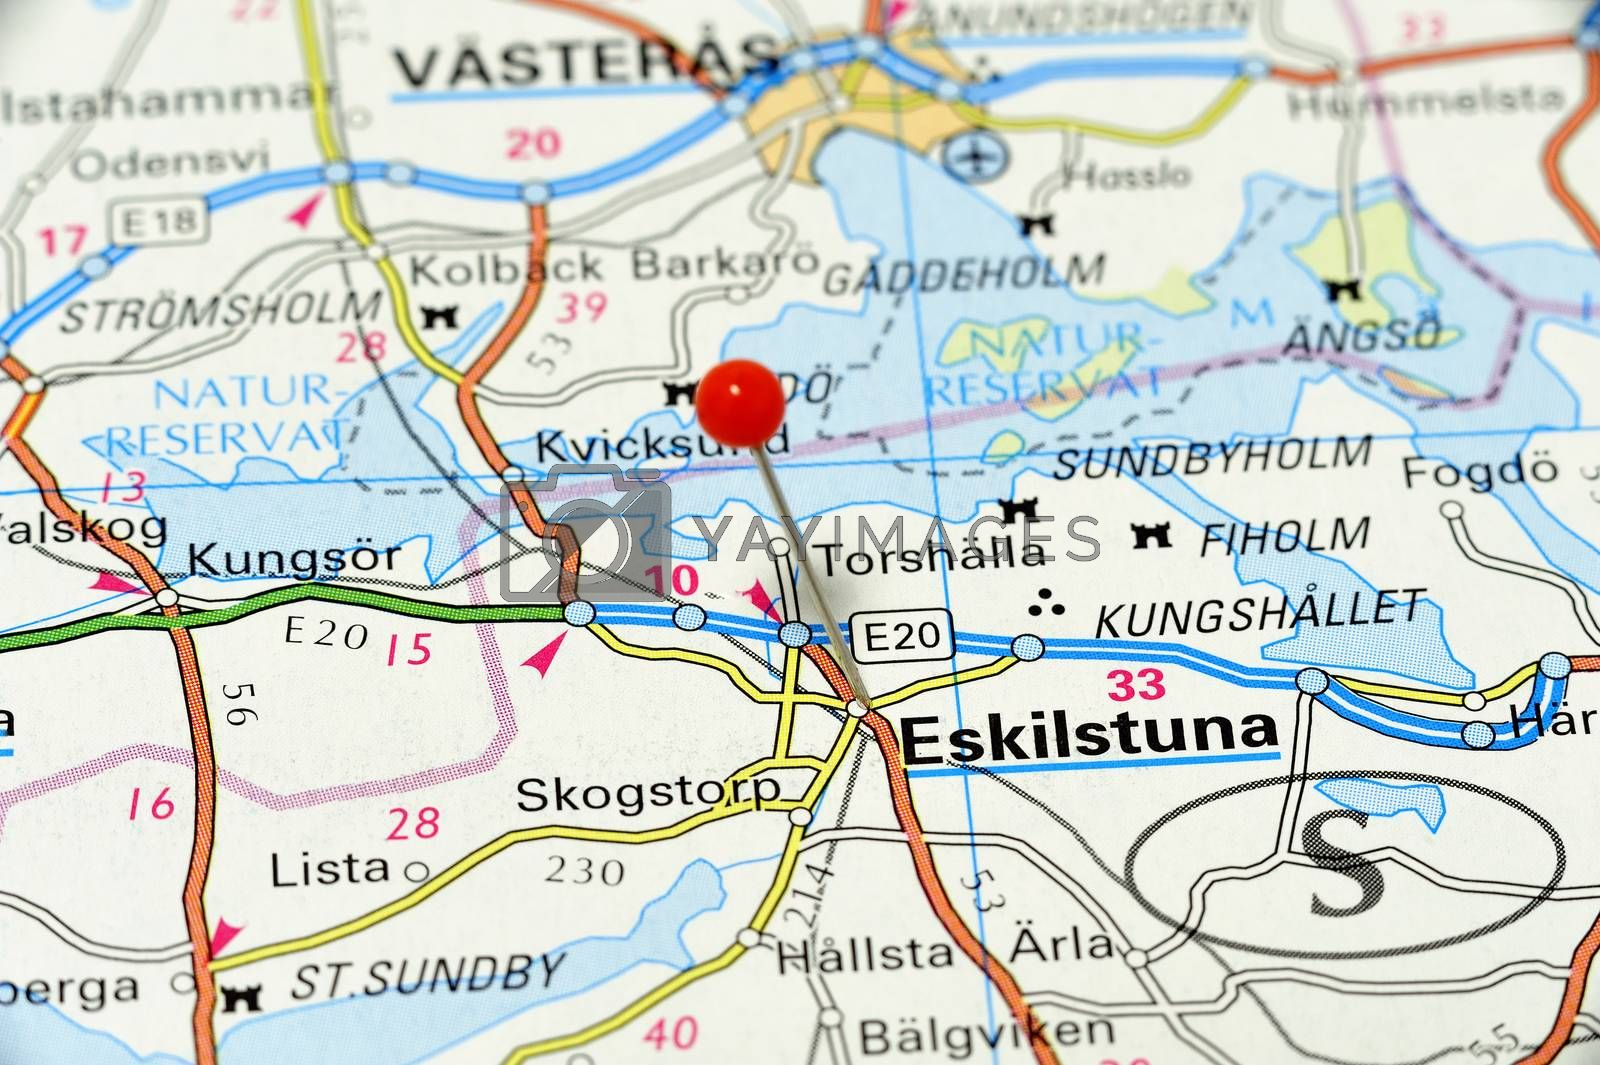 Closeup map of Eskilstuna. Eskilstuna a city in Sweden.